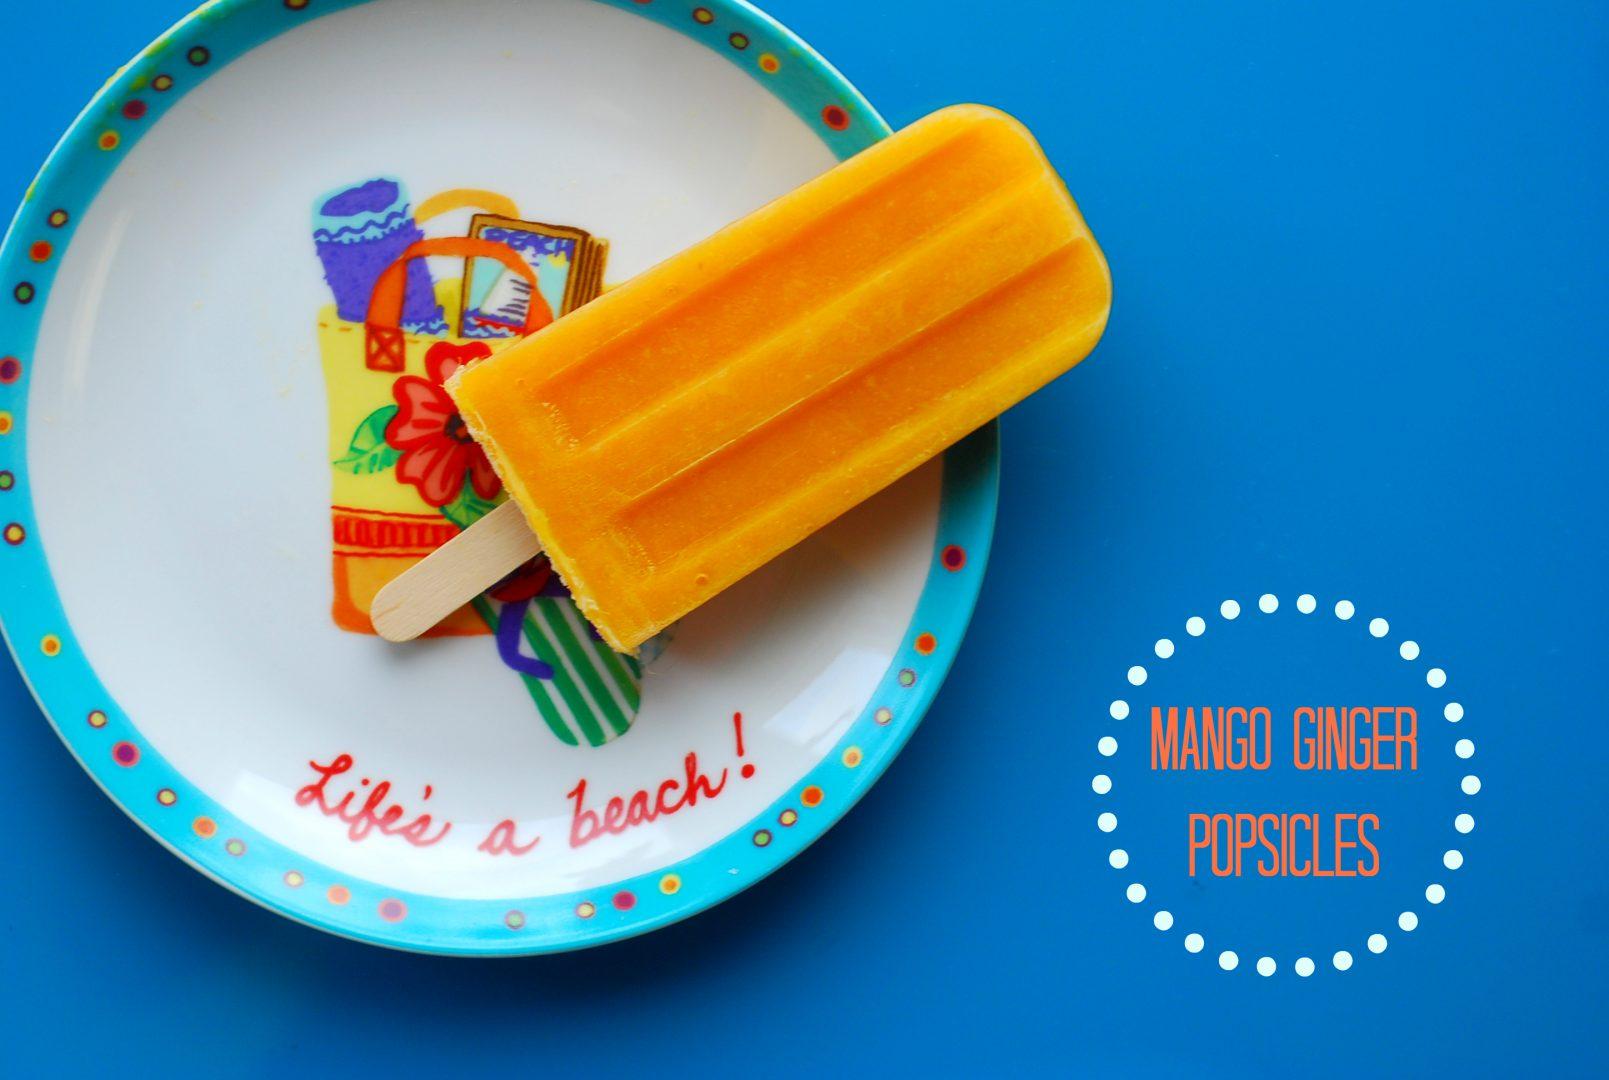 mango popsicles, how to make popsicles, mango dessert recipes